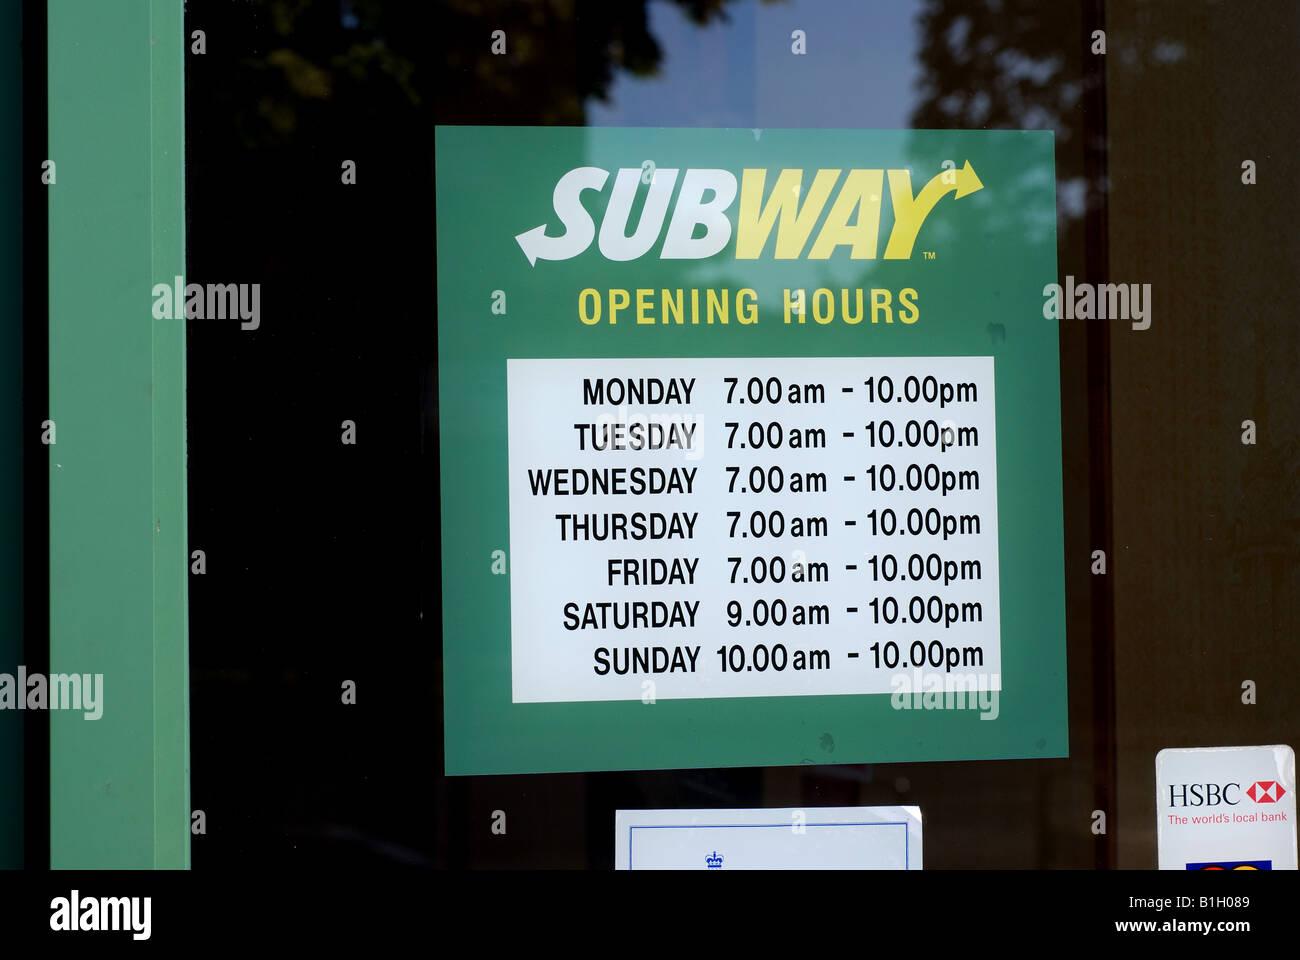 Subway Restaurant Opening Hours